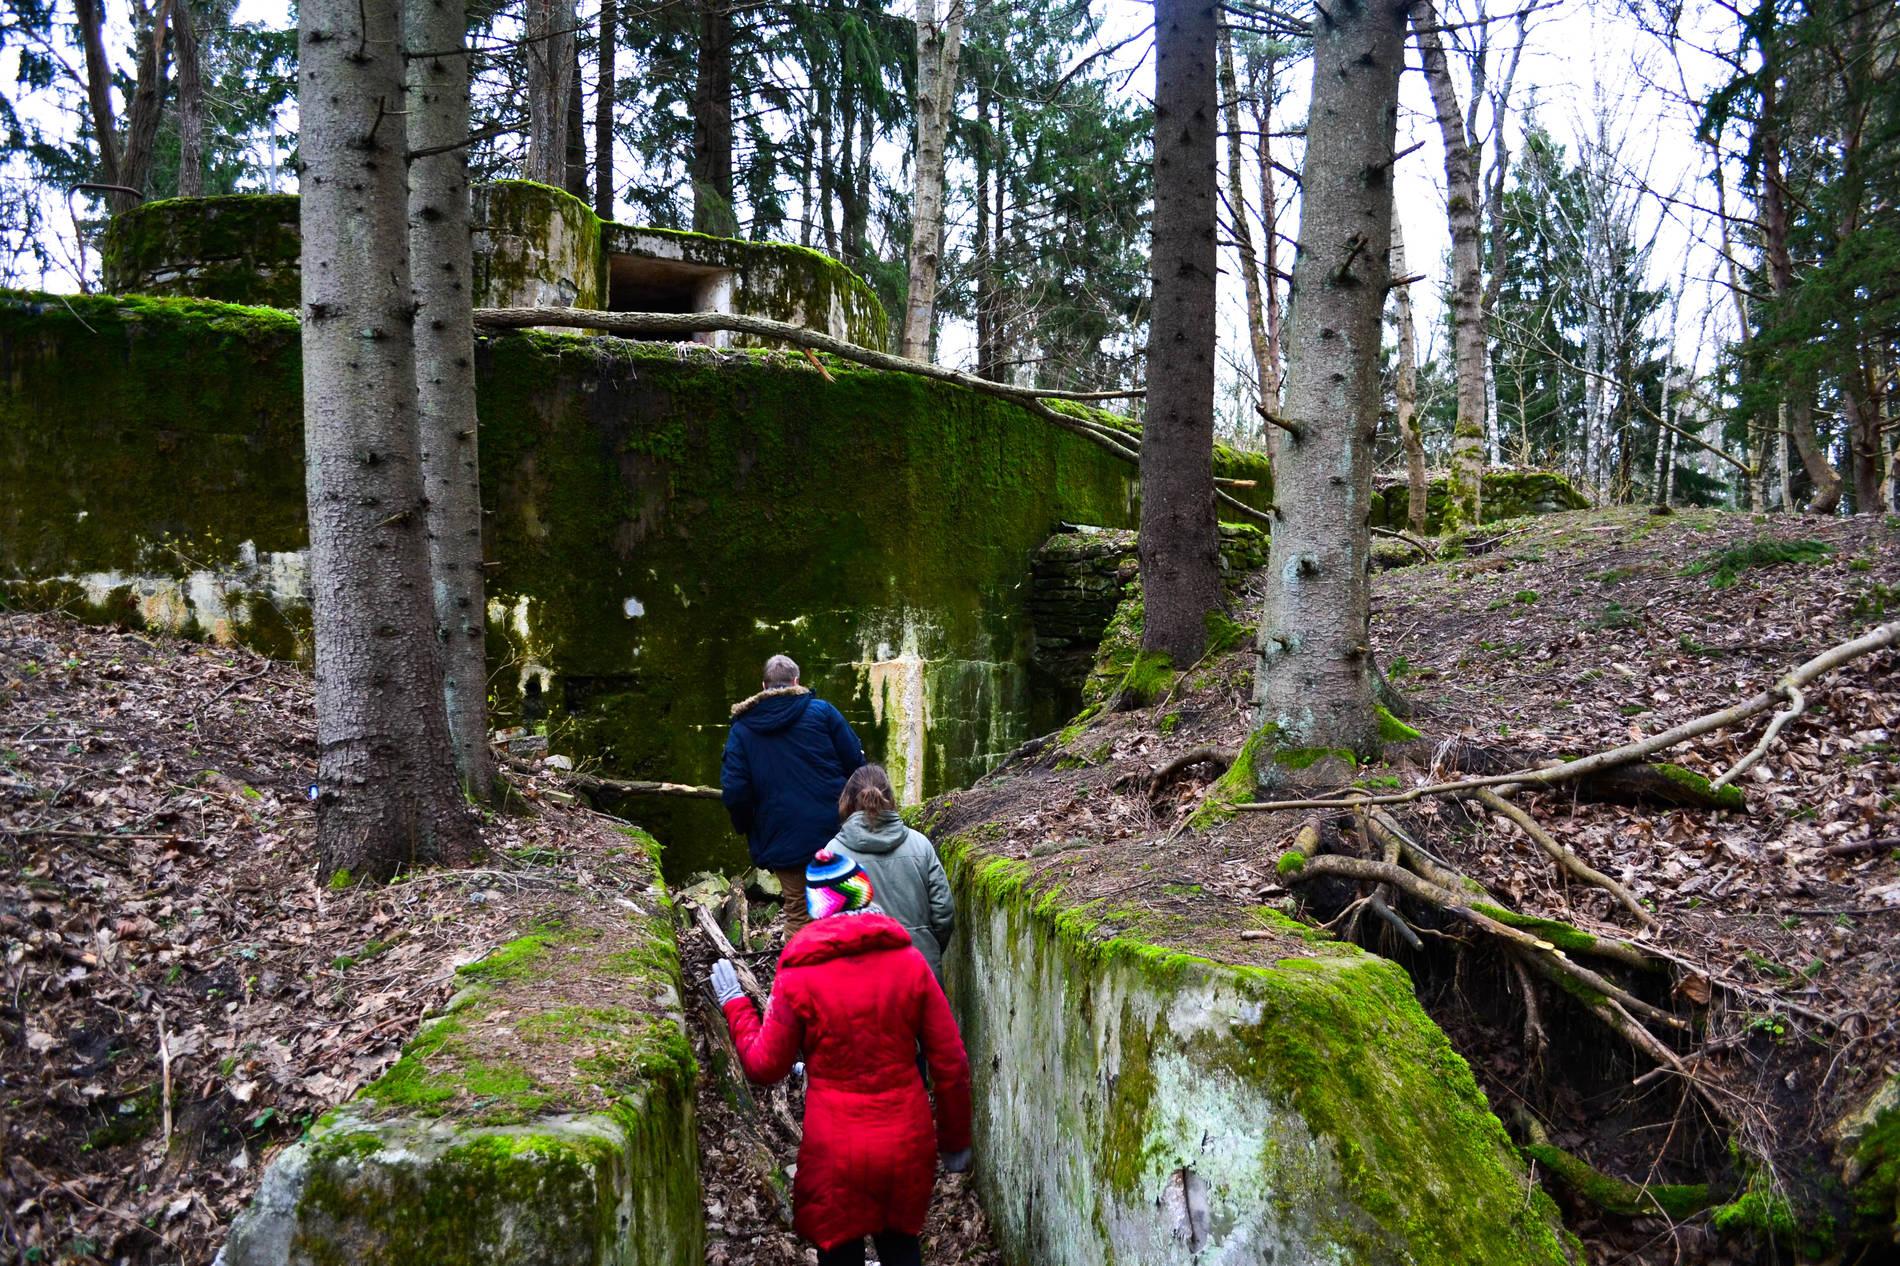 Catacombs in Paldiski, Estonia